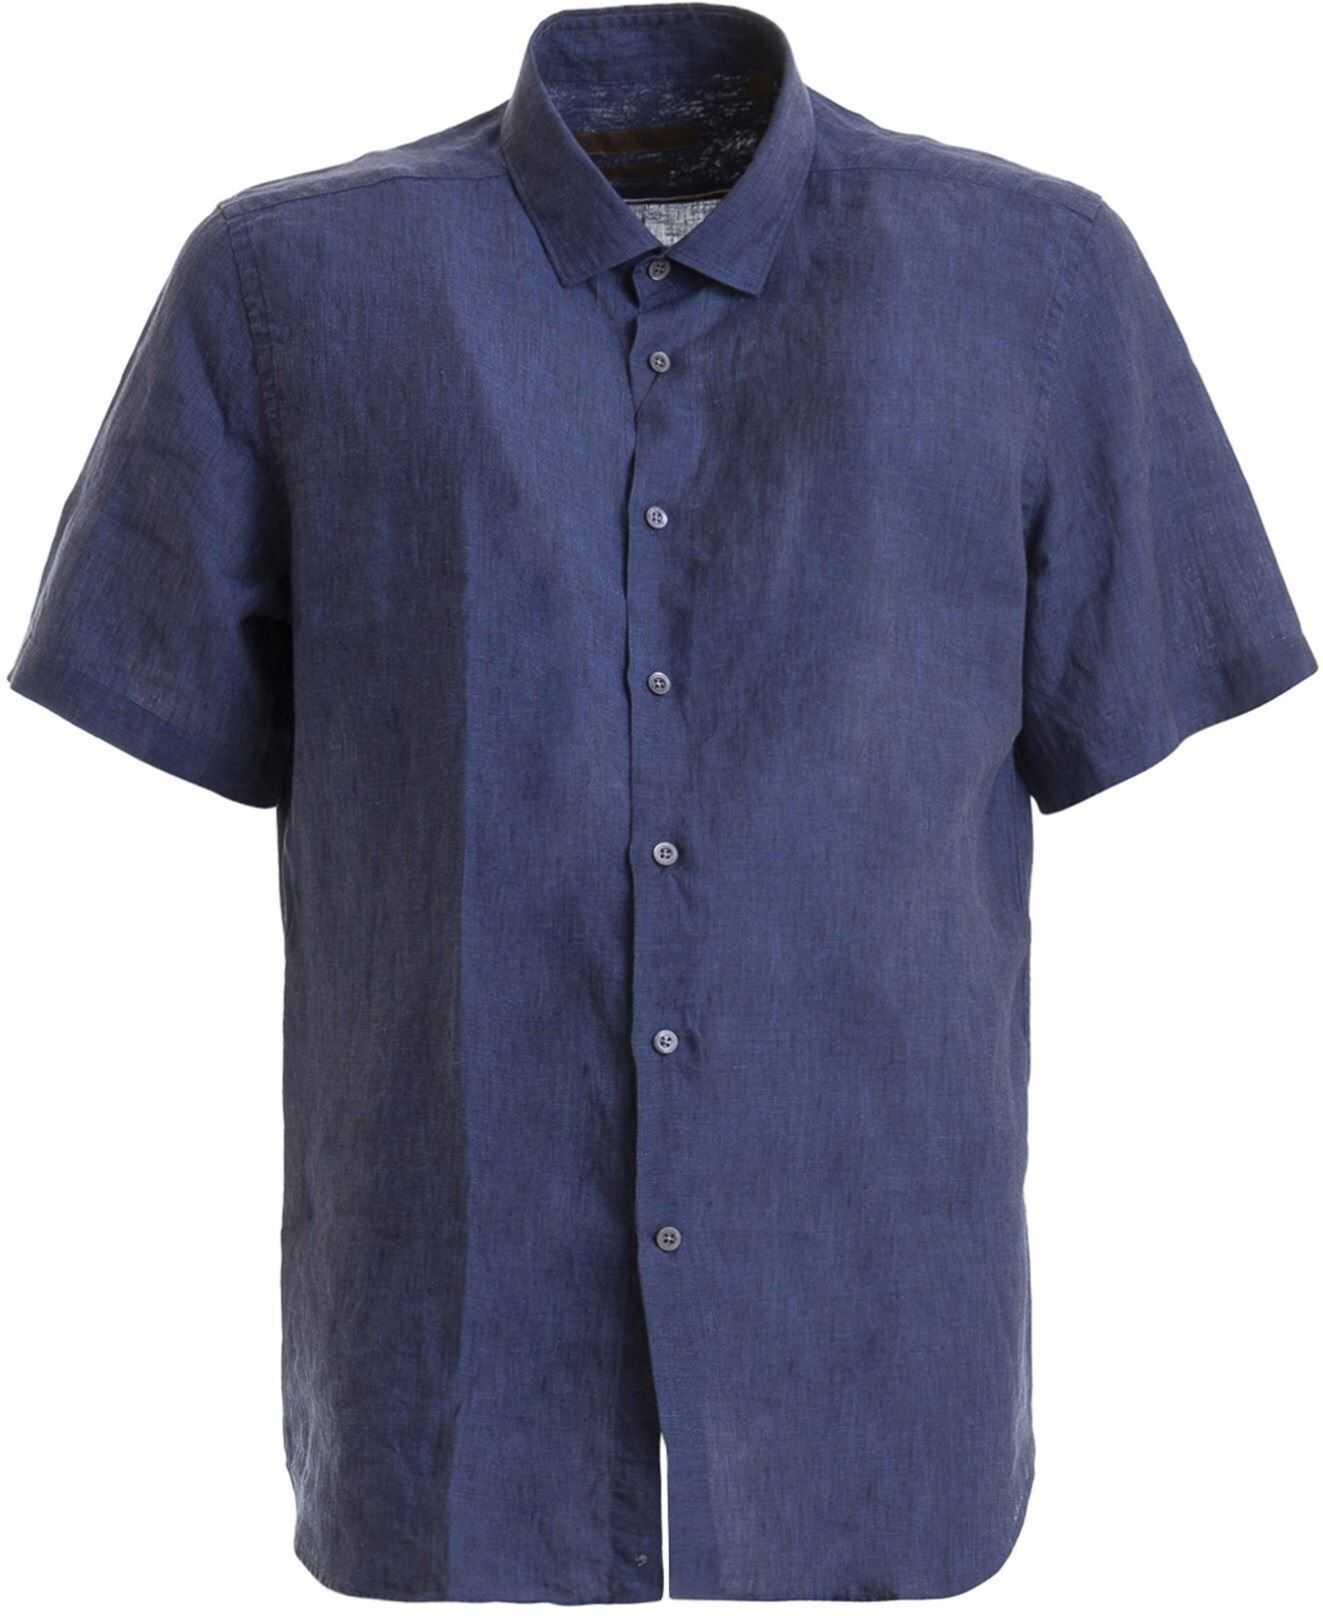 CORNELIANI Blue Linen Short Sleeve Shirt Blue imagine